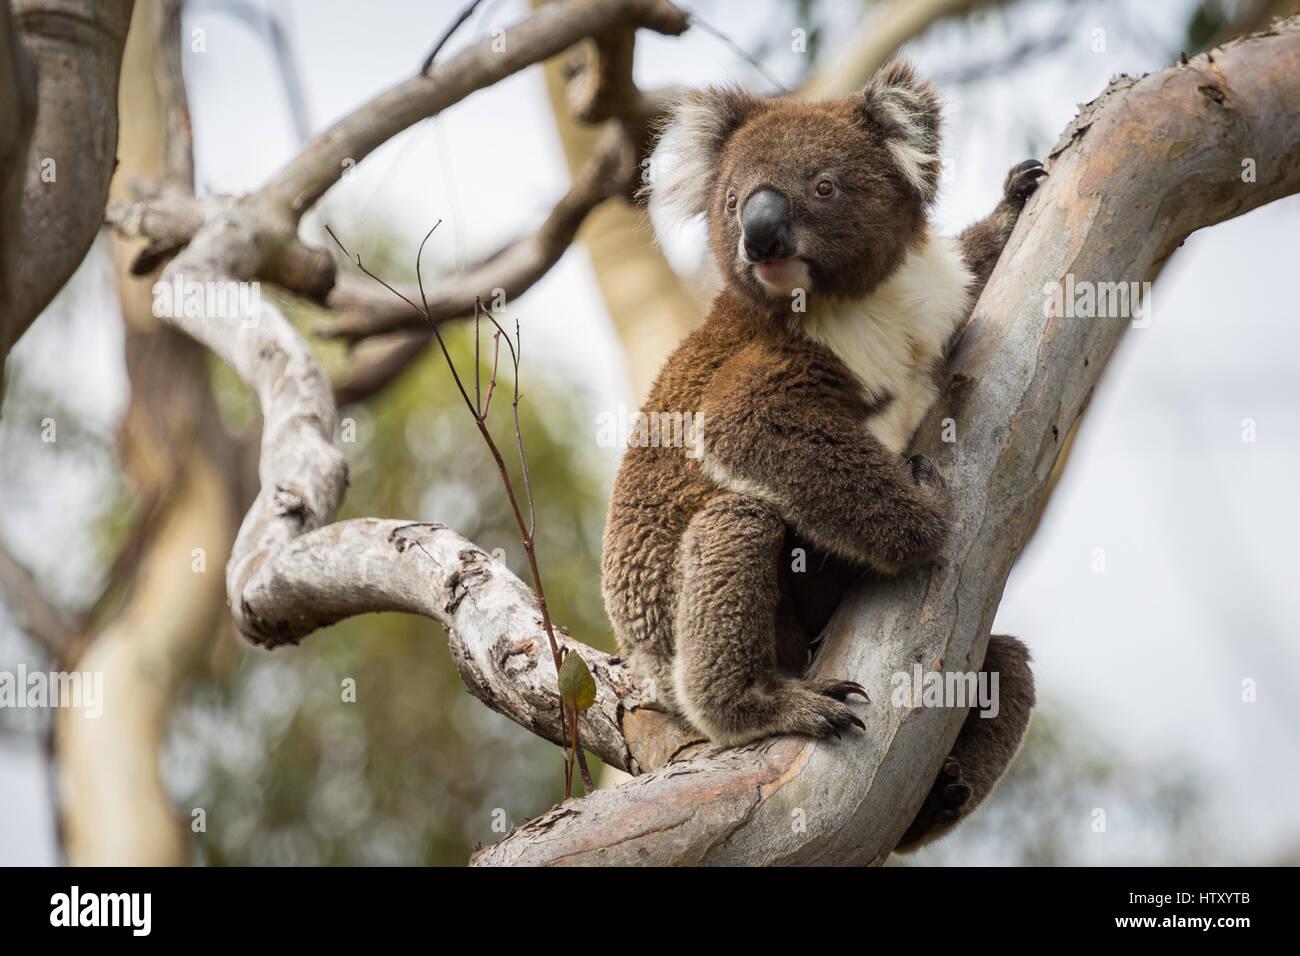 Koala (Phascolarctos cinereus) - Stock Image